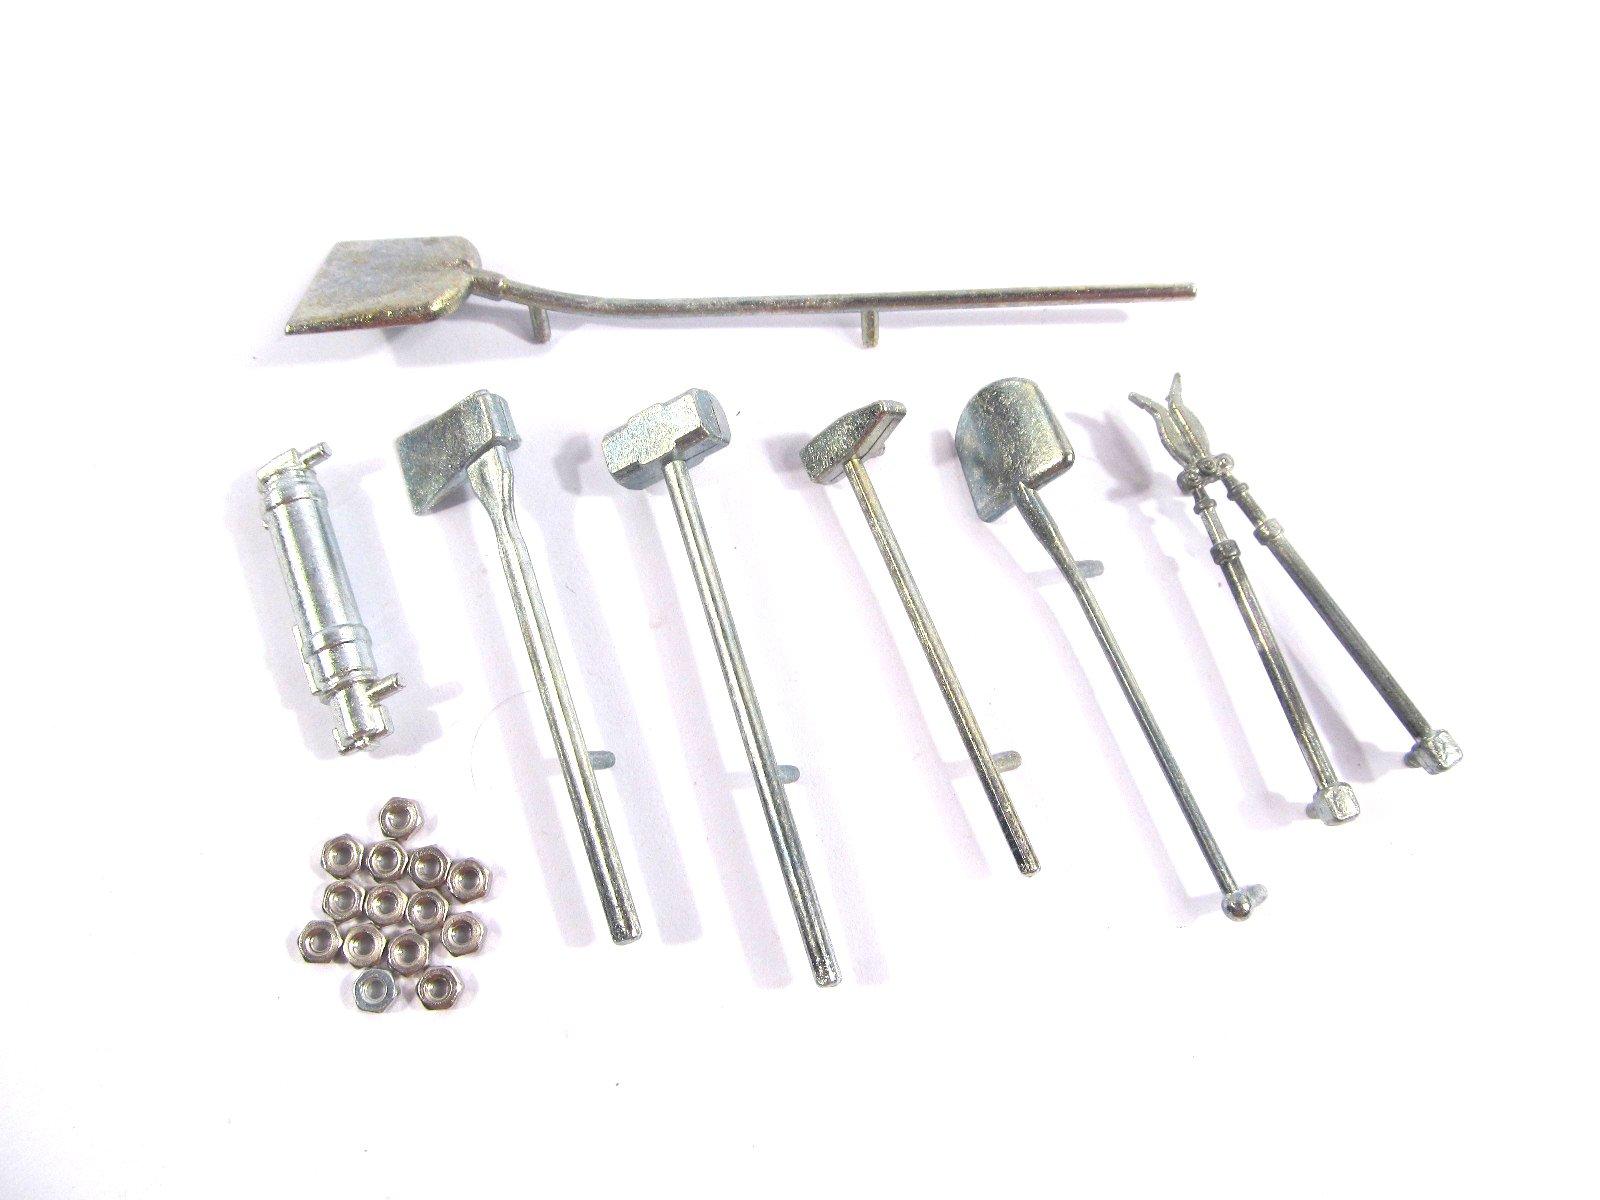 Mato Metal tool kit for Heng Long 3818-1 1/16 1:16 RC Germany Tiger 1 tank Shovel Hammer Axe Scissors Fire extinguisher